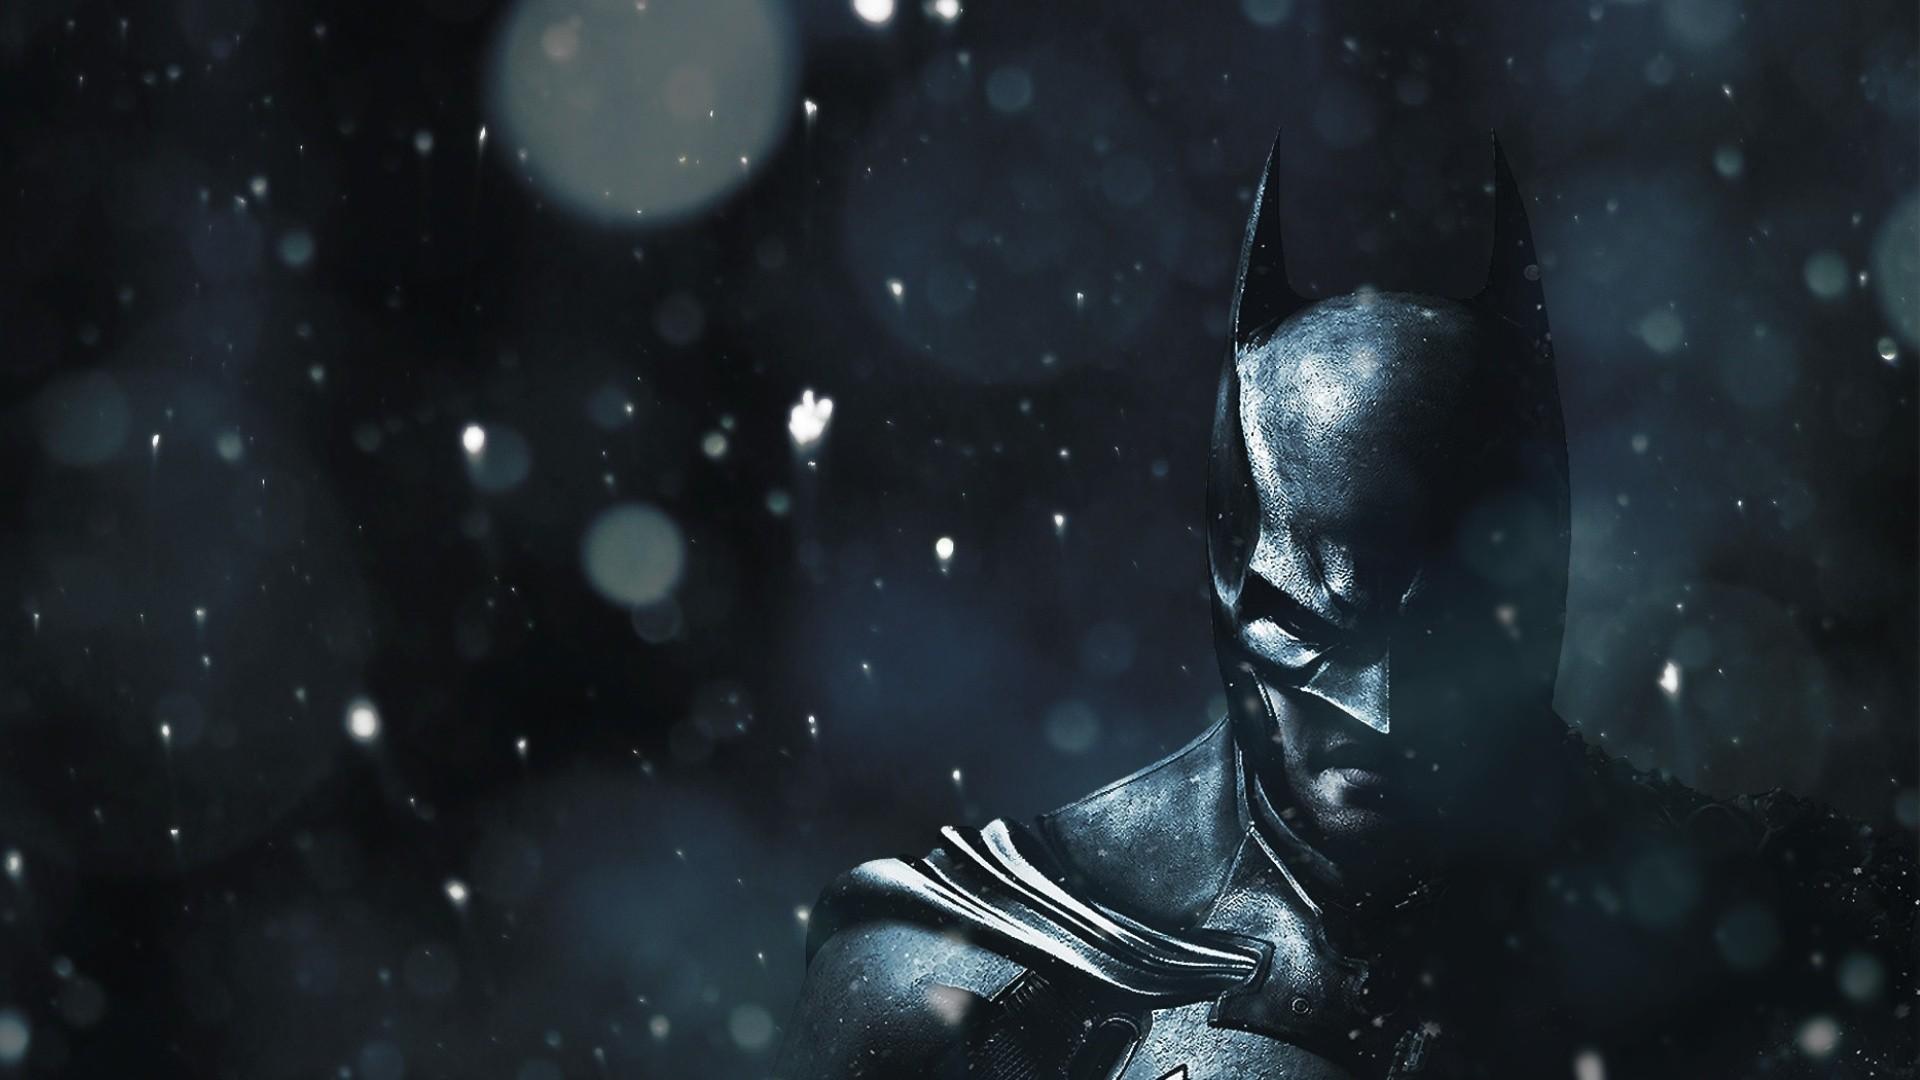 Gallery For gt Batman Wallpaper 1920x1080